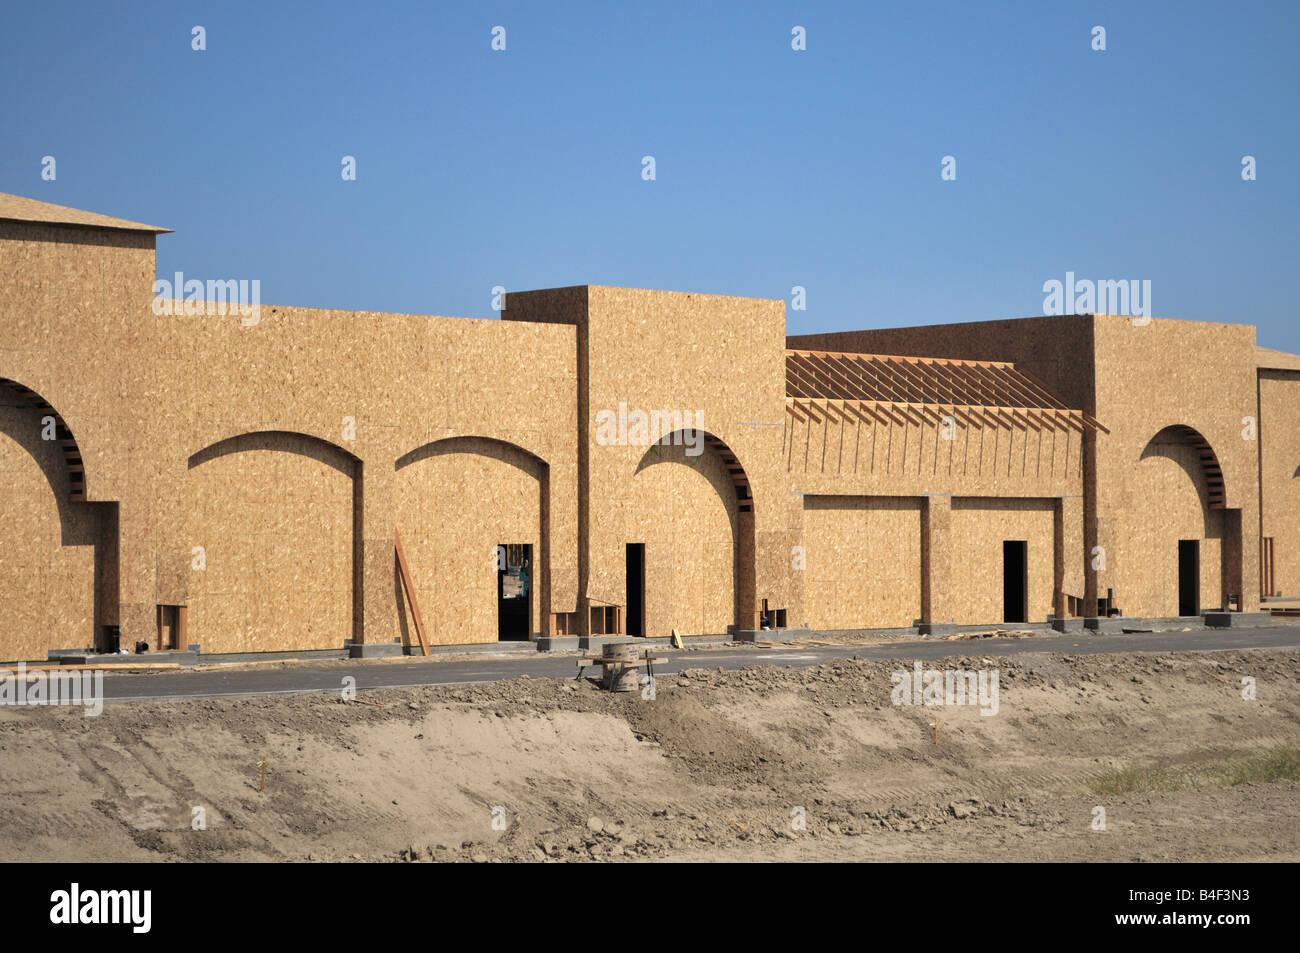 New shopping mall under construction in Camarillo, California - Stock Image